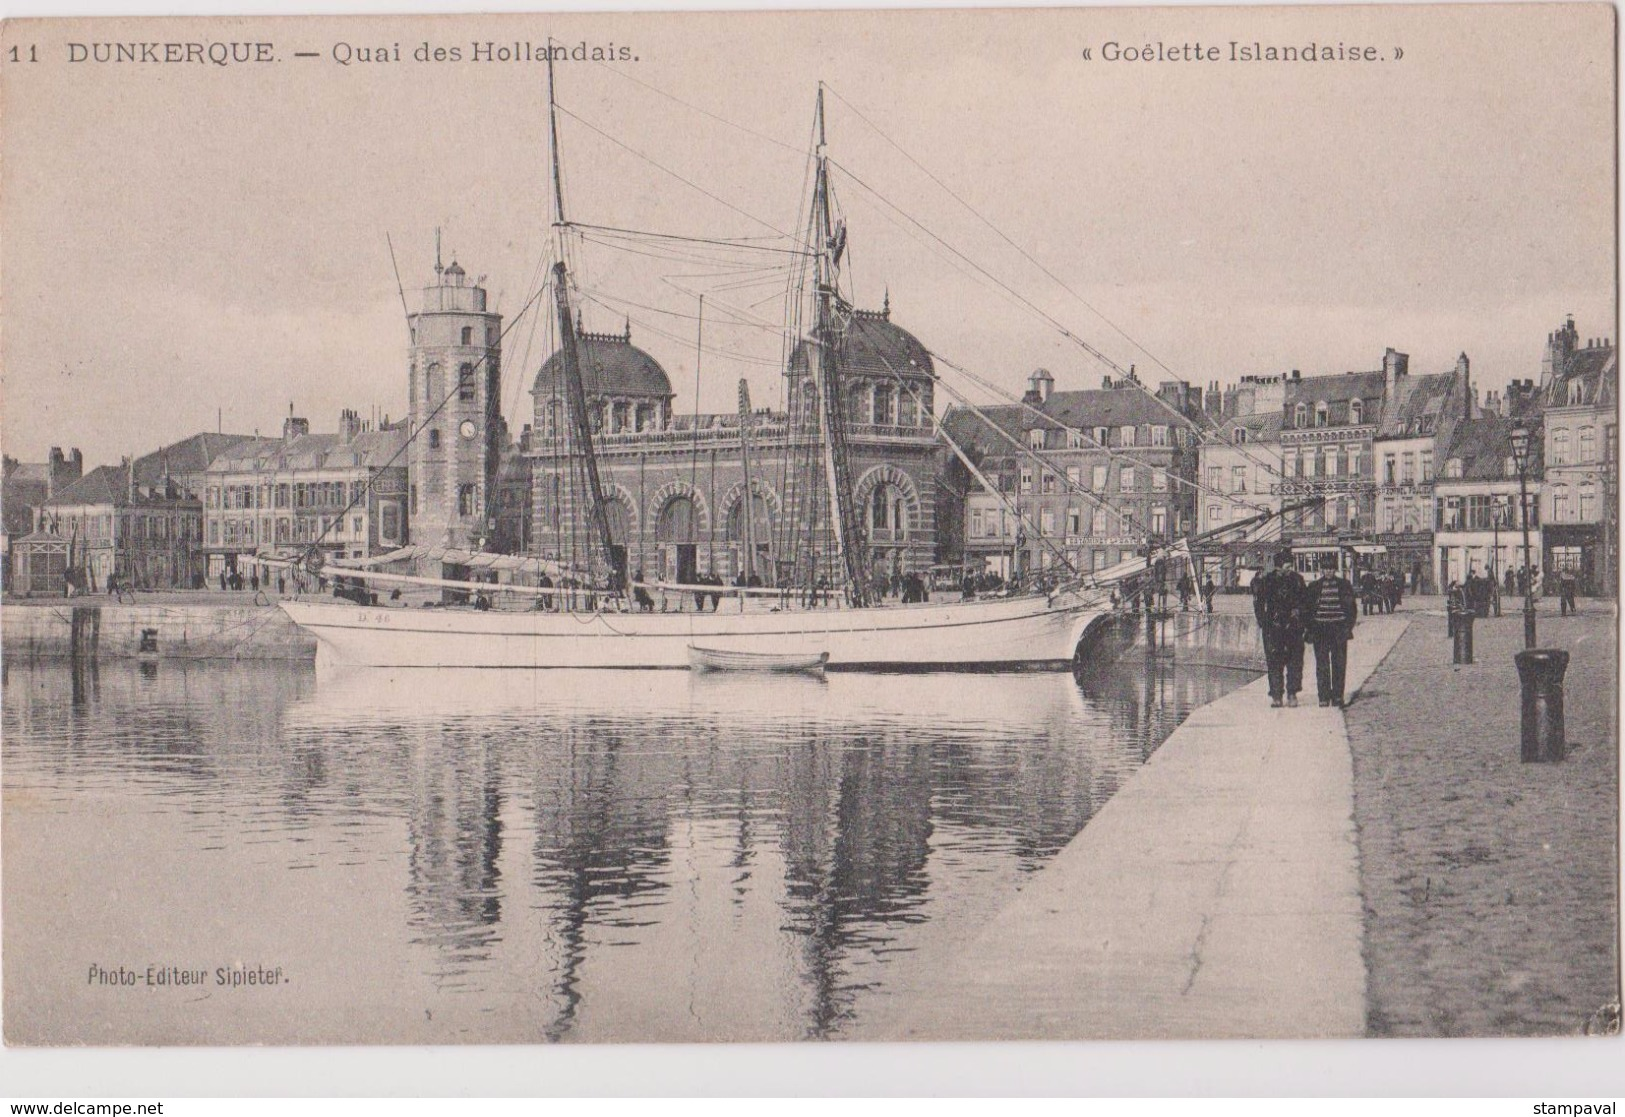 DUNKERQUE - QUAI DES HOLLANDAIS - GOELETTE ISLANDAISE - N° 11 - Segelboote